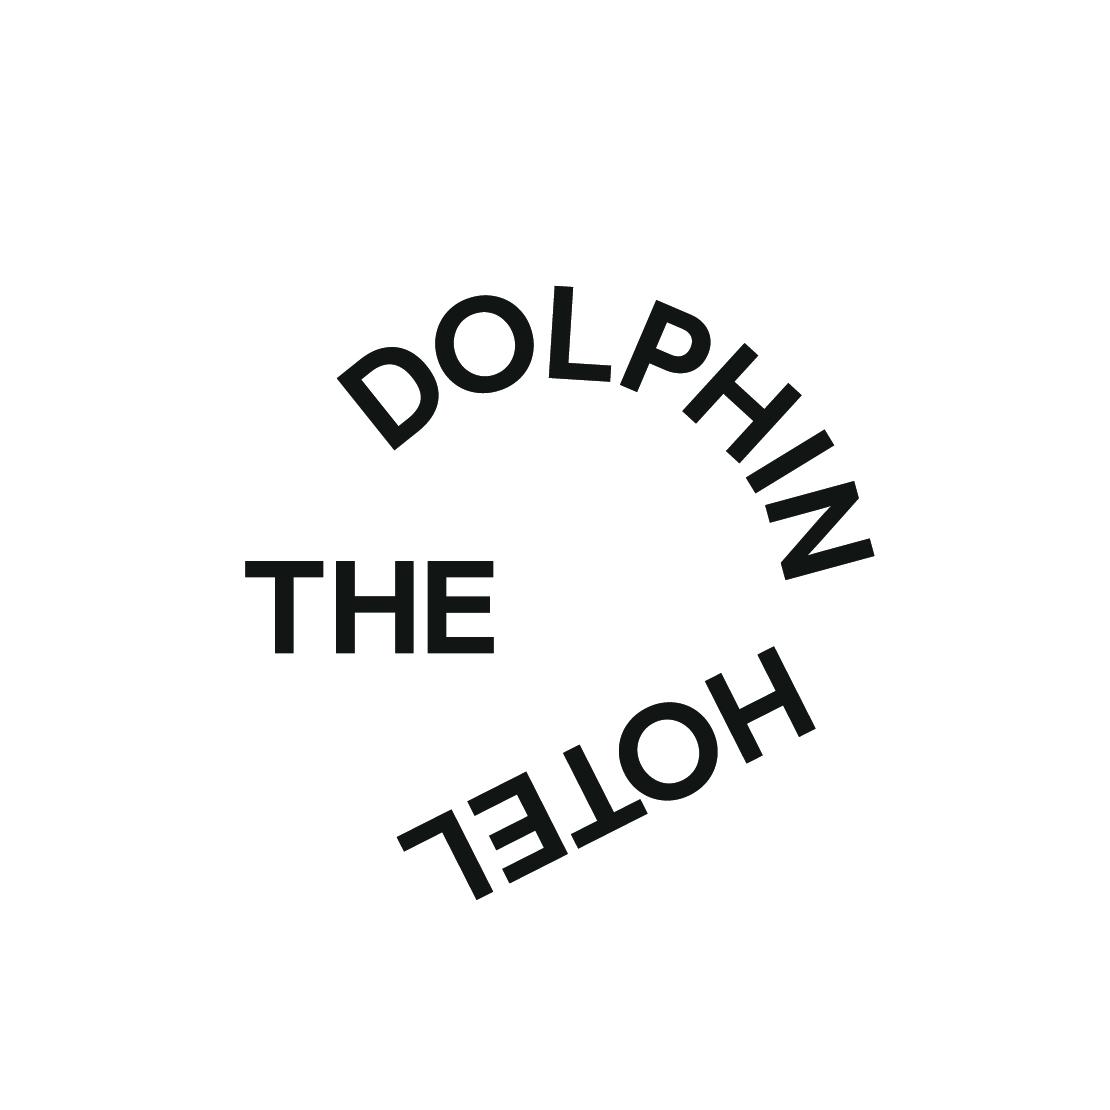 TheDolphin_Hotel_LockUp_Digital_Sponsor-01.jpg